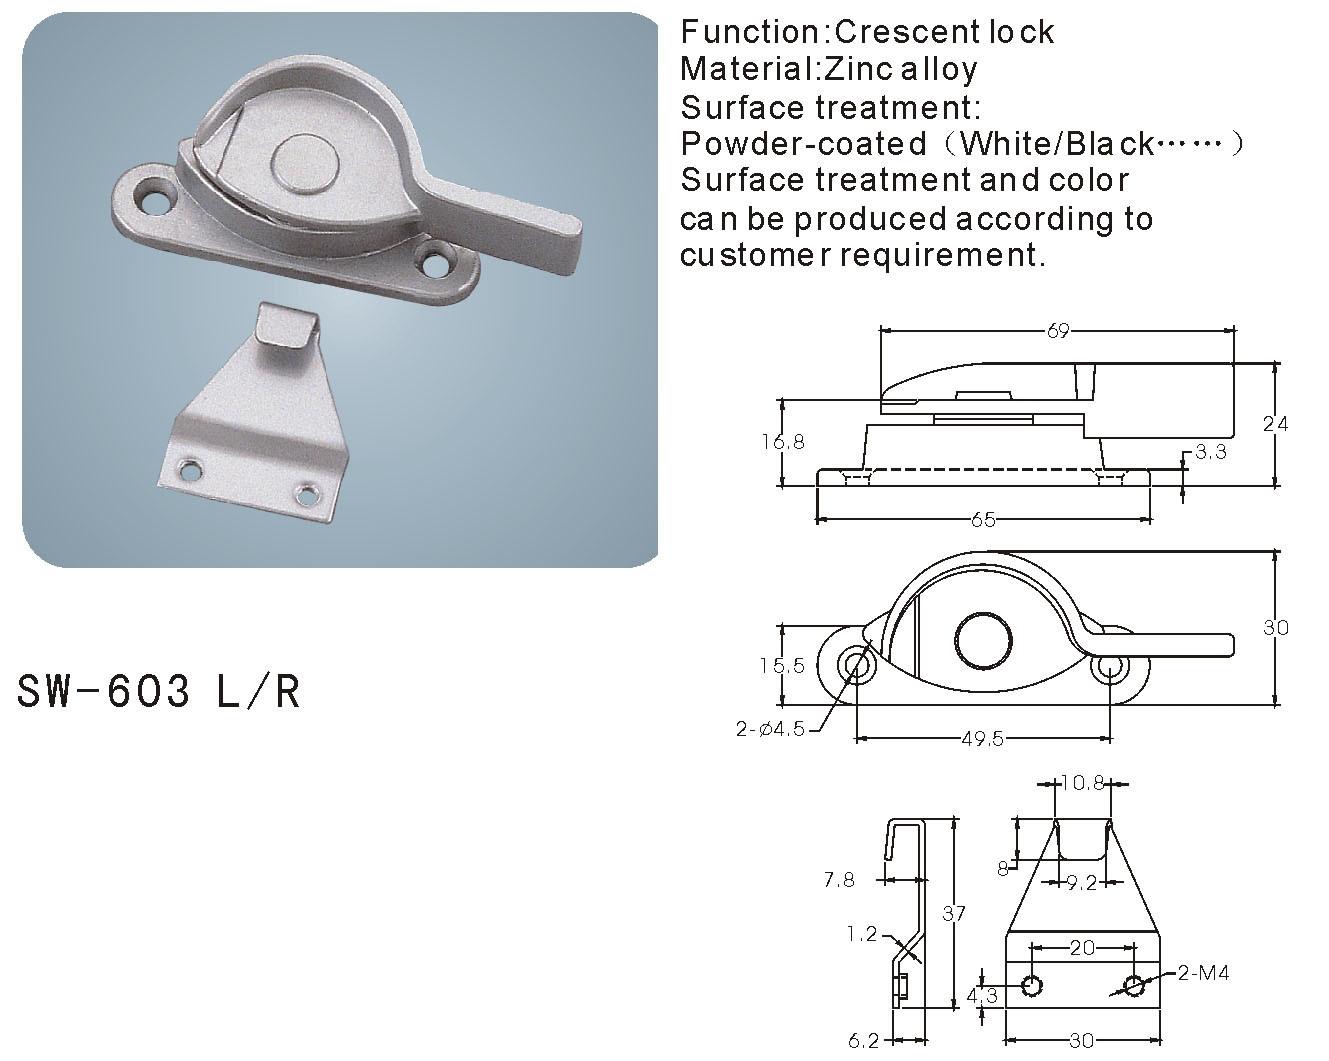 Crescent Lock for Window and Door (SW-603 L/R)